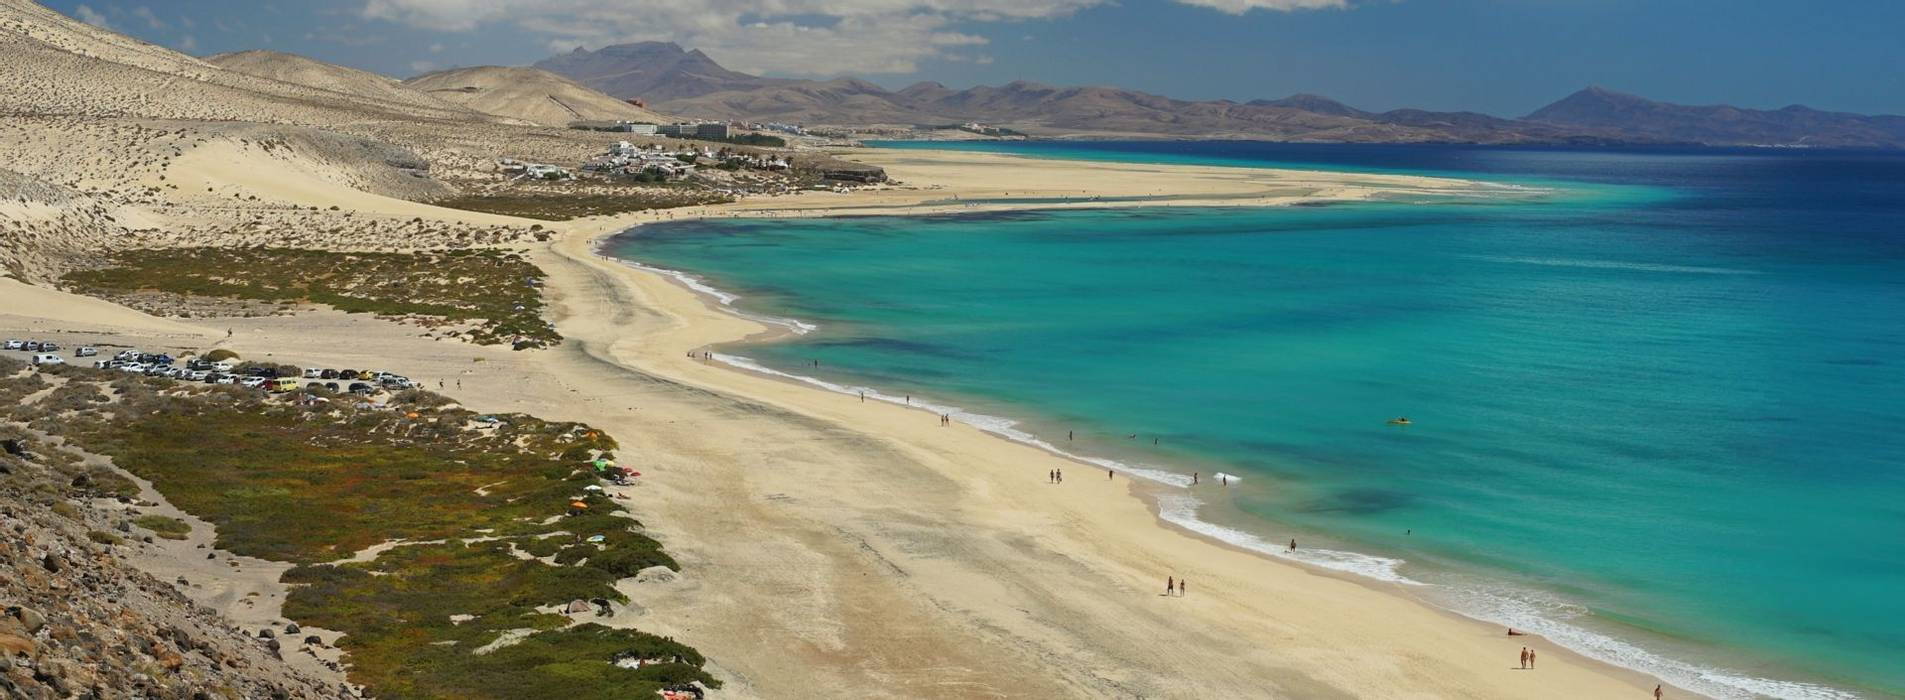 Solos Winter Sun Canary Islands